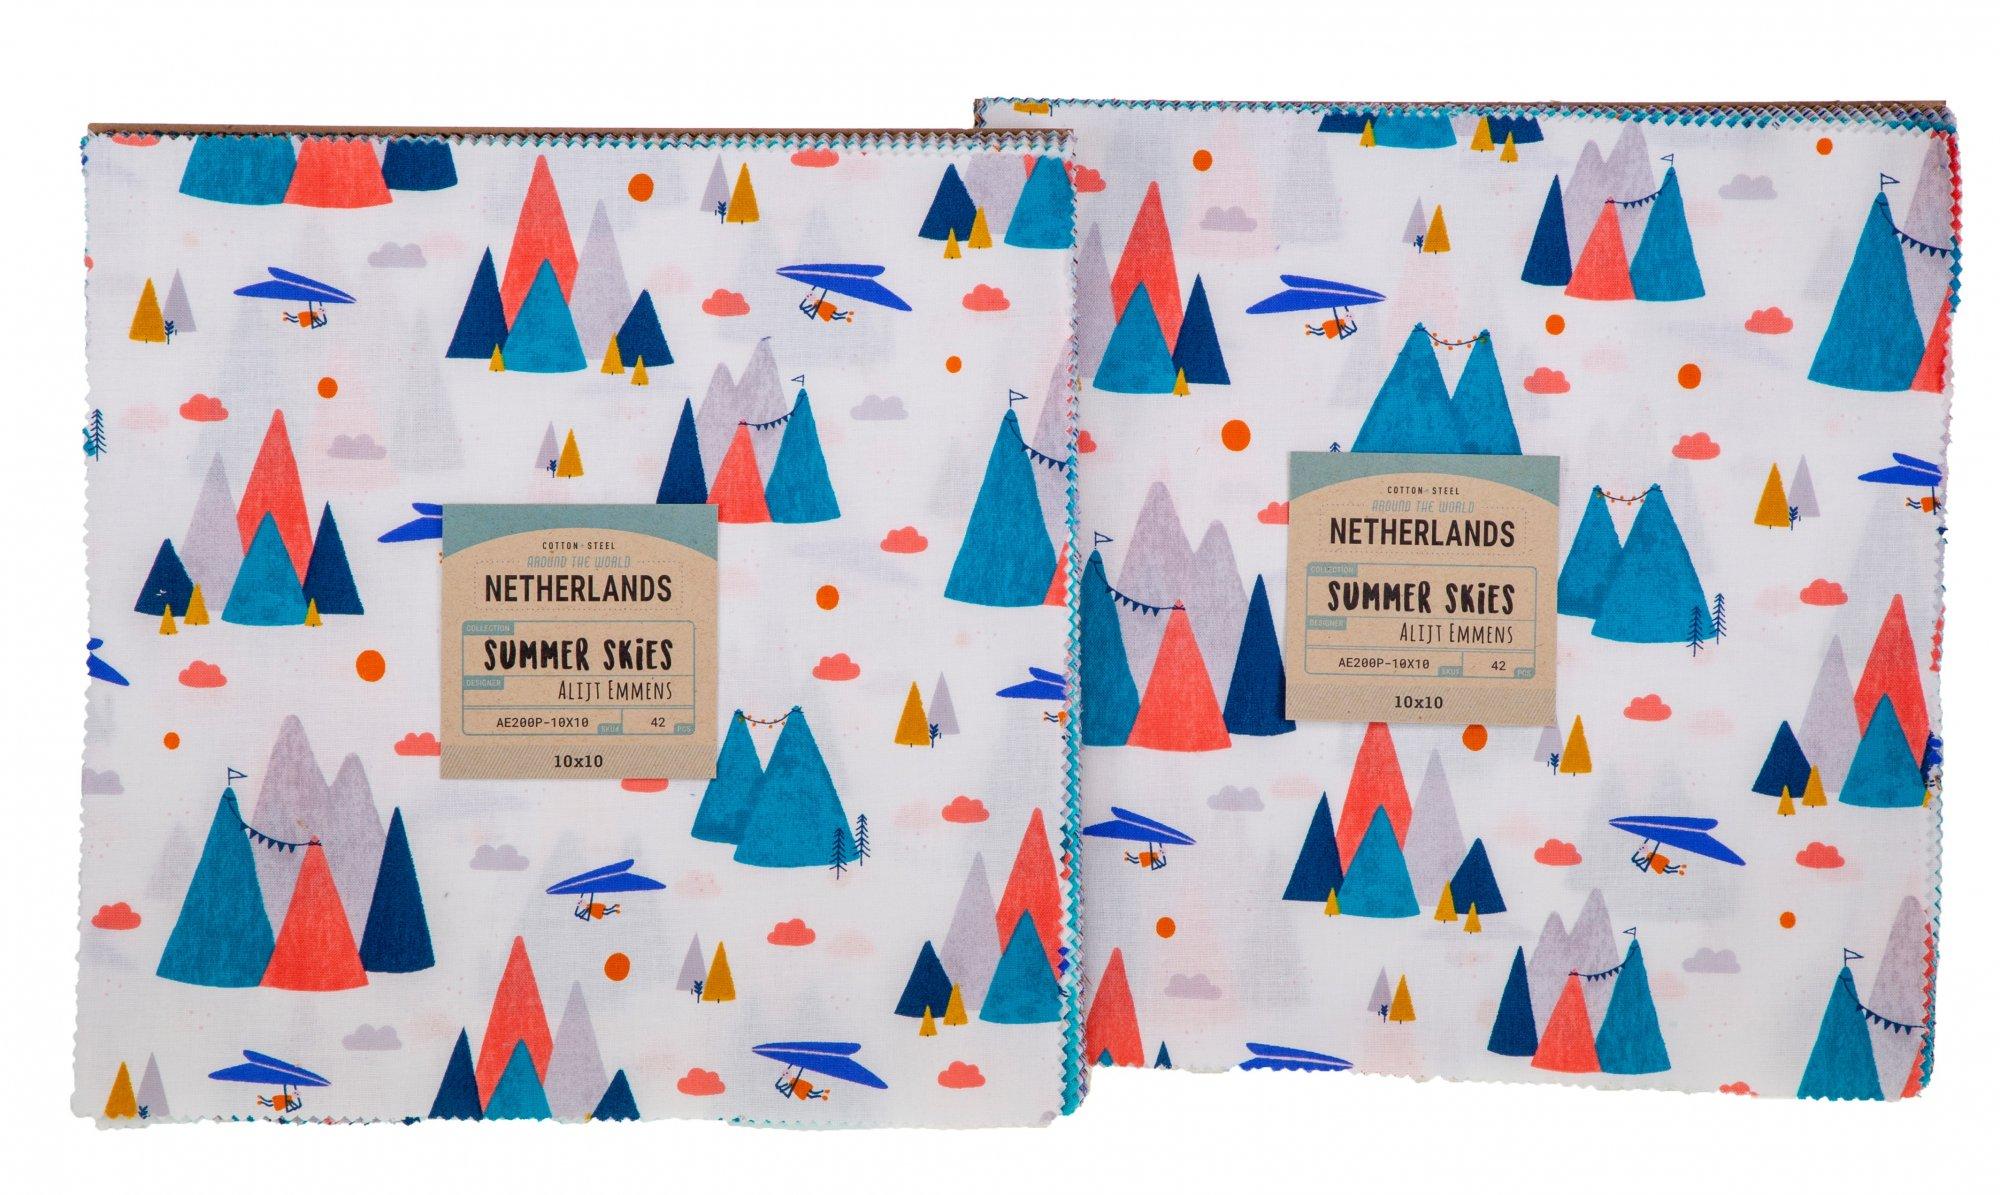 Summer Skies 10x10 Pack 42pcs